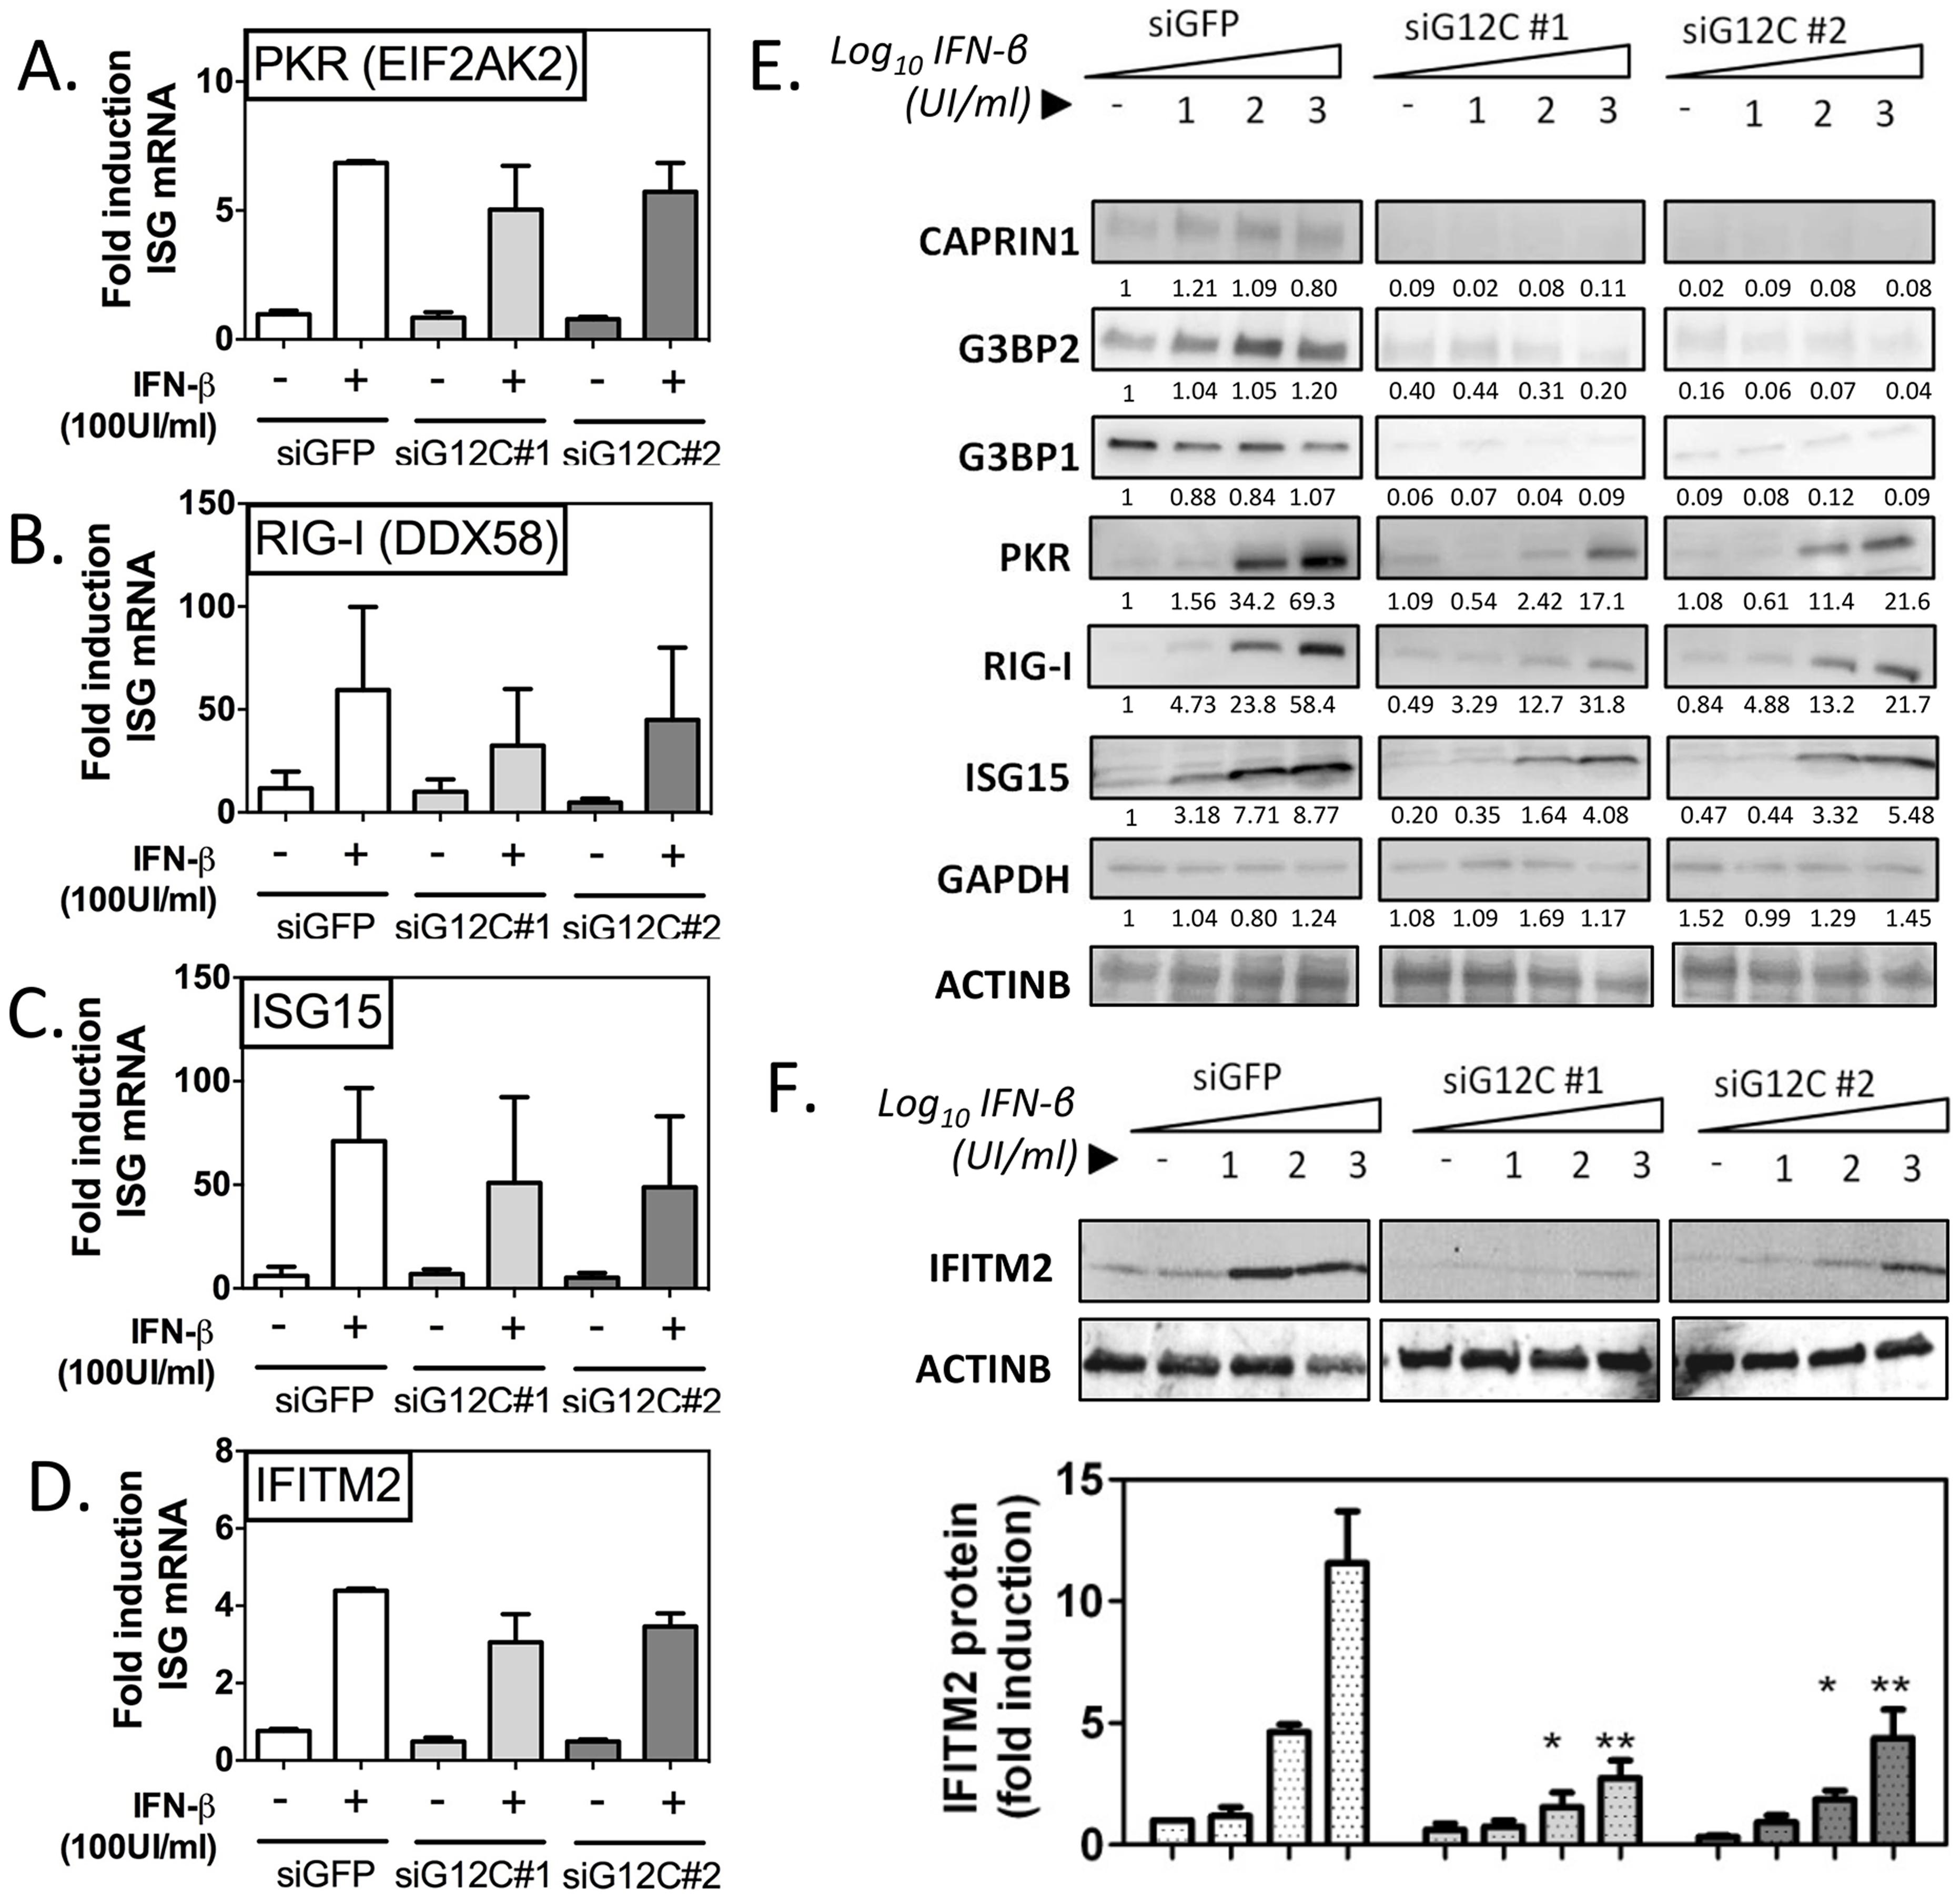 G3BP1, G3BP2 and CAPRIN1 regulate establishment of the antiviral state.